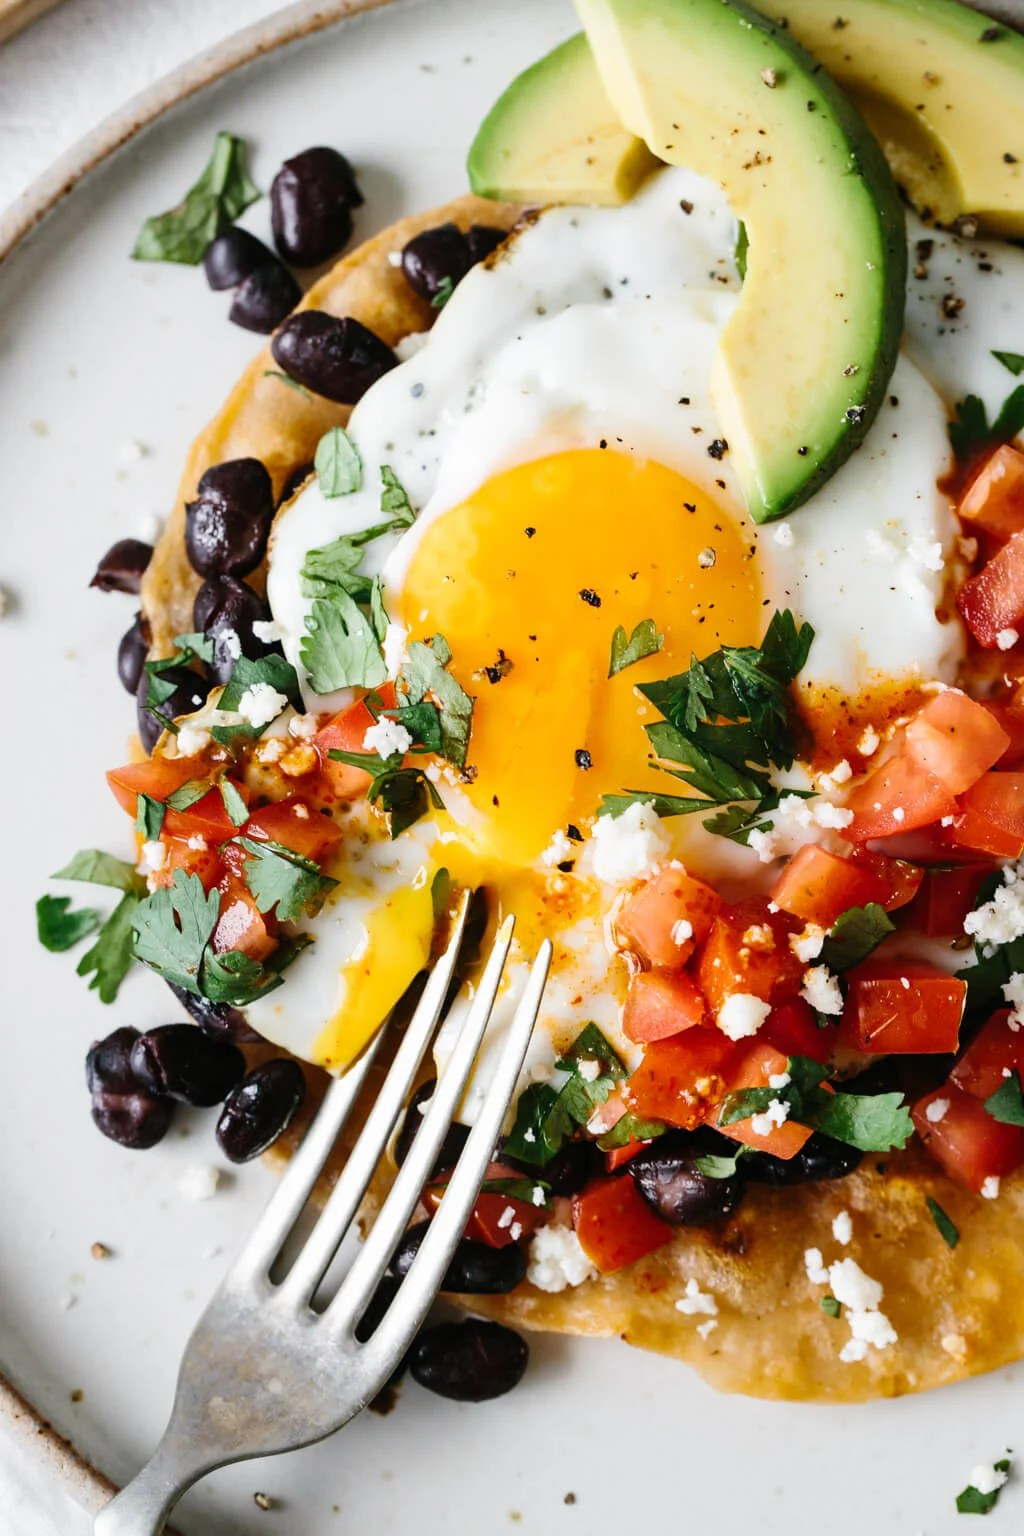 A fork broke open the yolk on a plate of huevos rancheros.